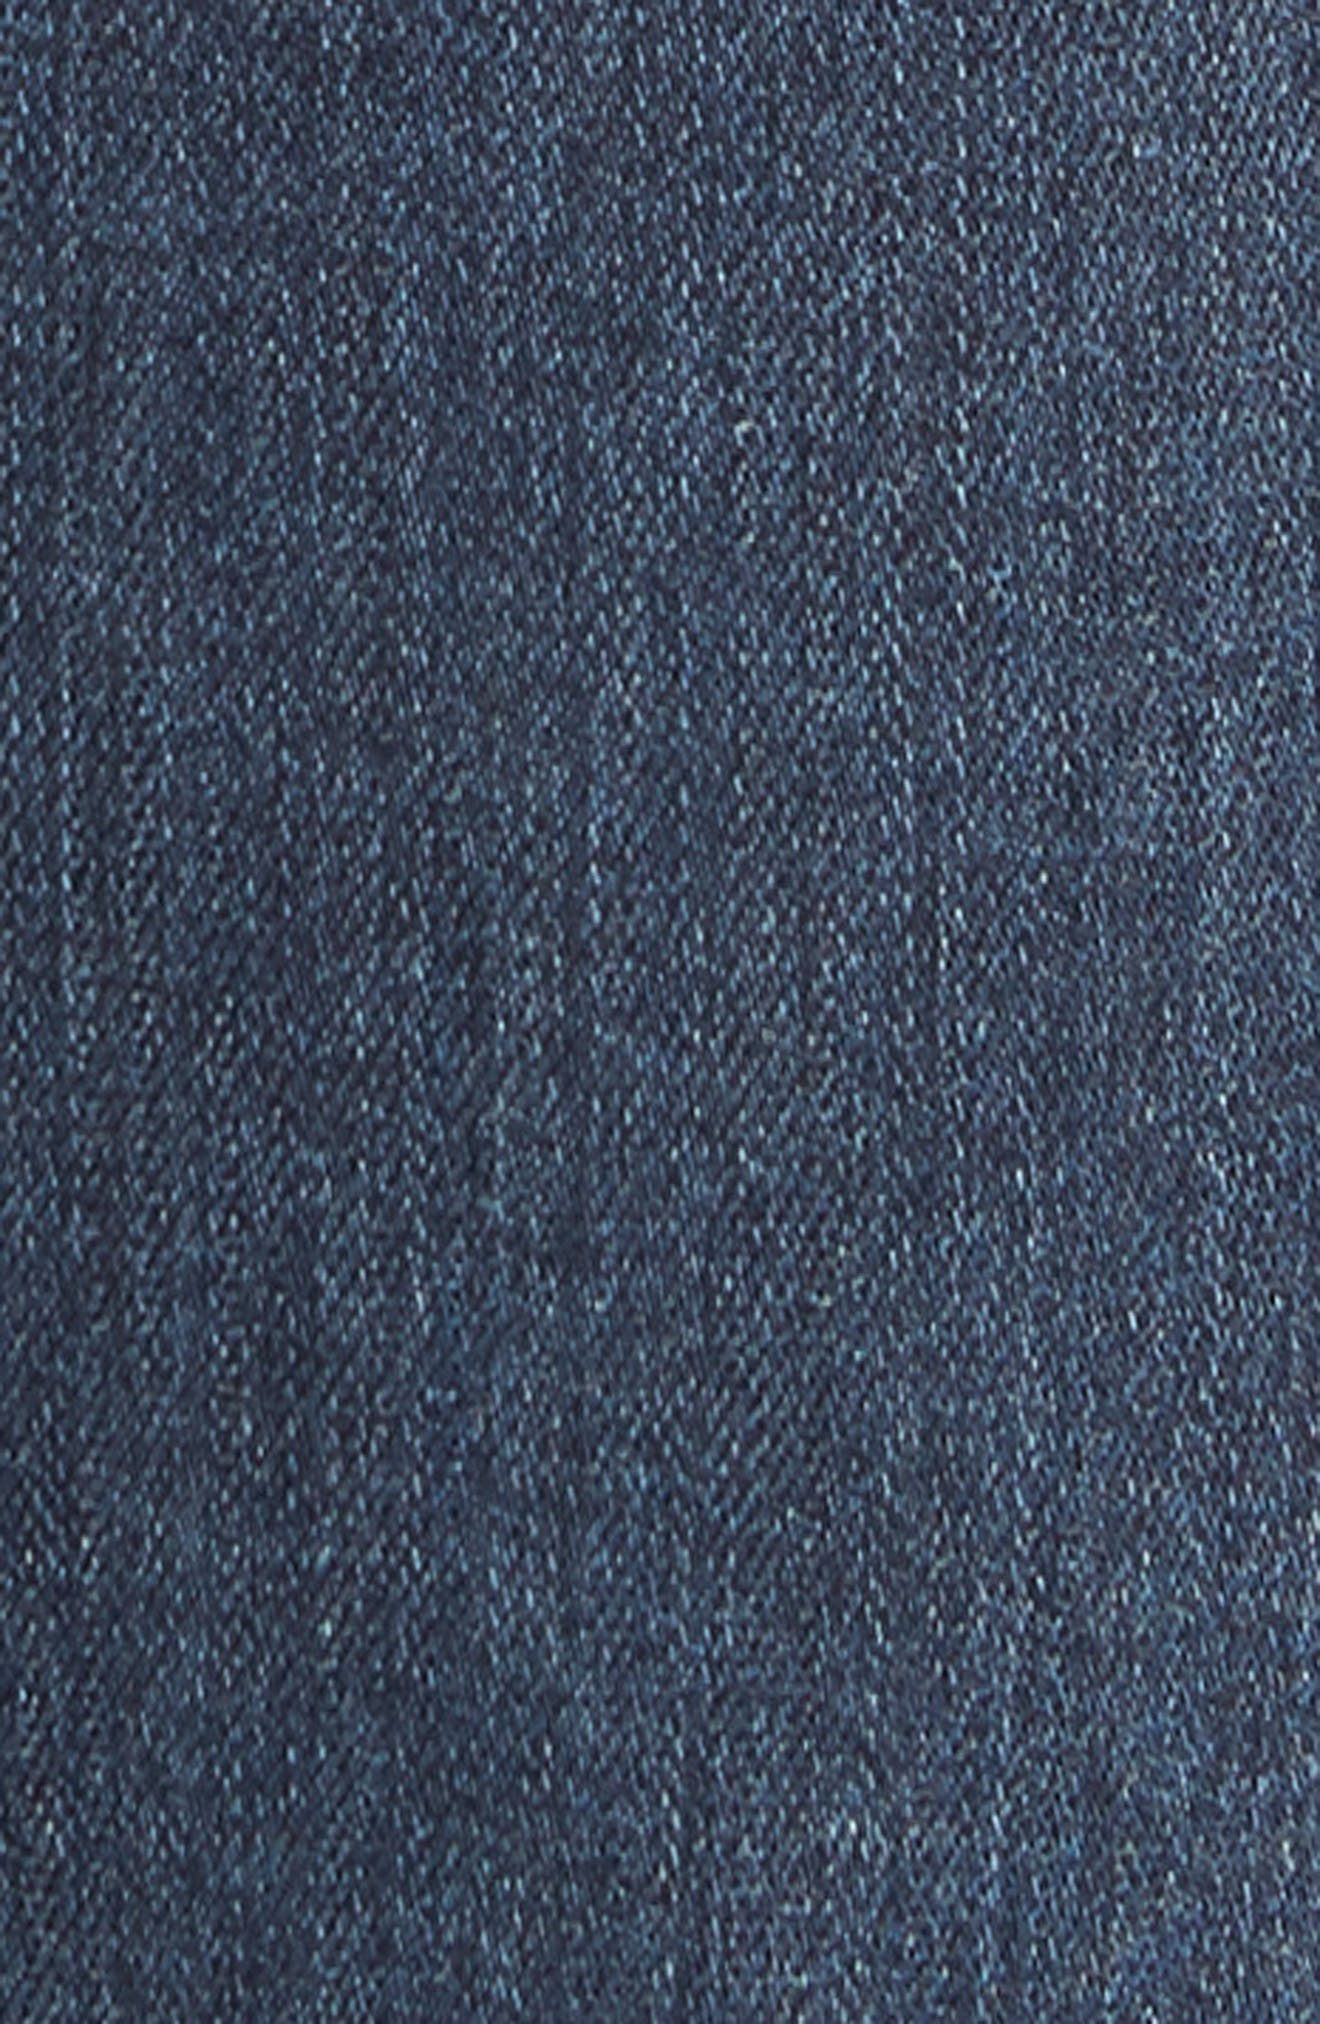 Transcend - Croft Skinny Fit Jeans,                             Alternate thumbnail 5, color,                             GRAMMERCY